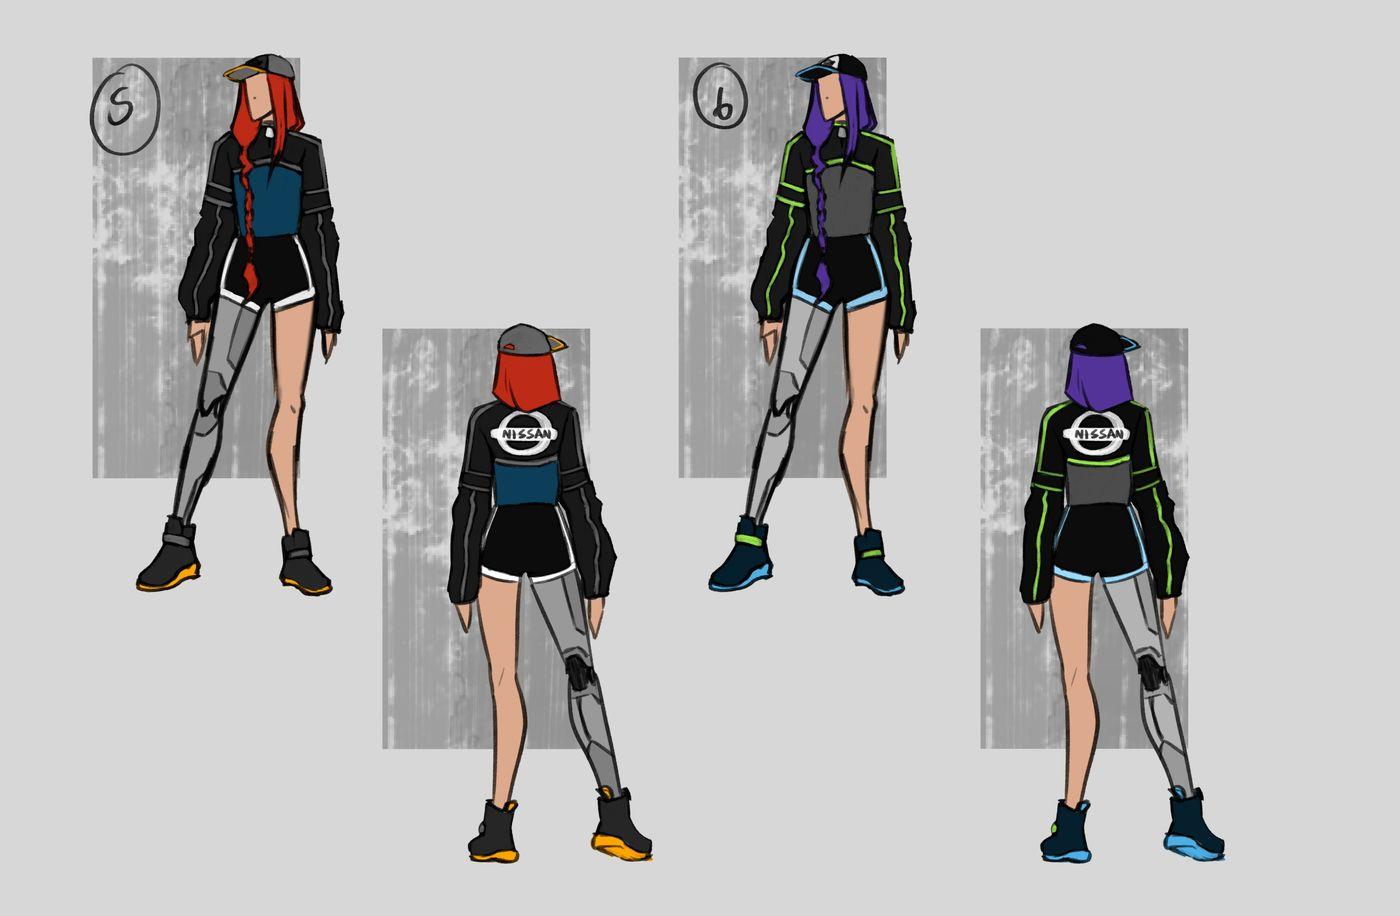 Steer Jasmine %20 Scme3420 Rookies %20 Character Design Colour Passes03 Jasminesteer